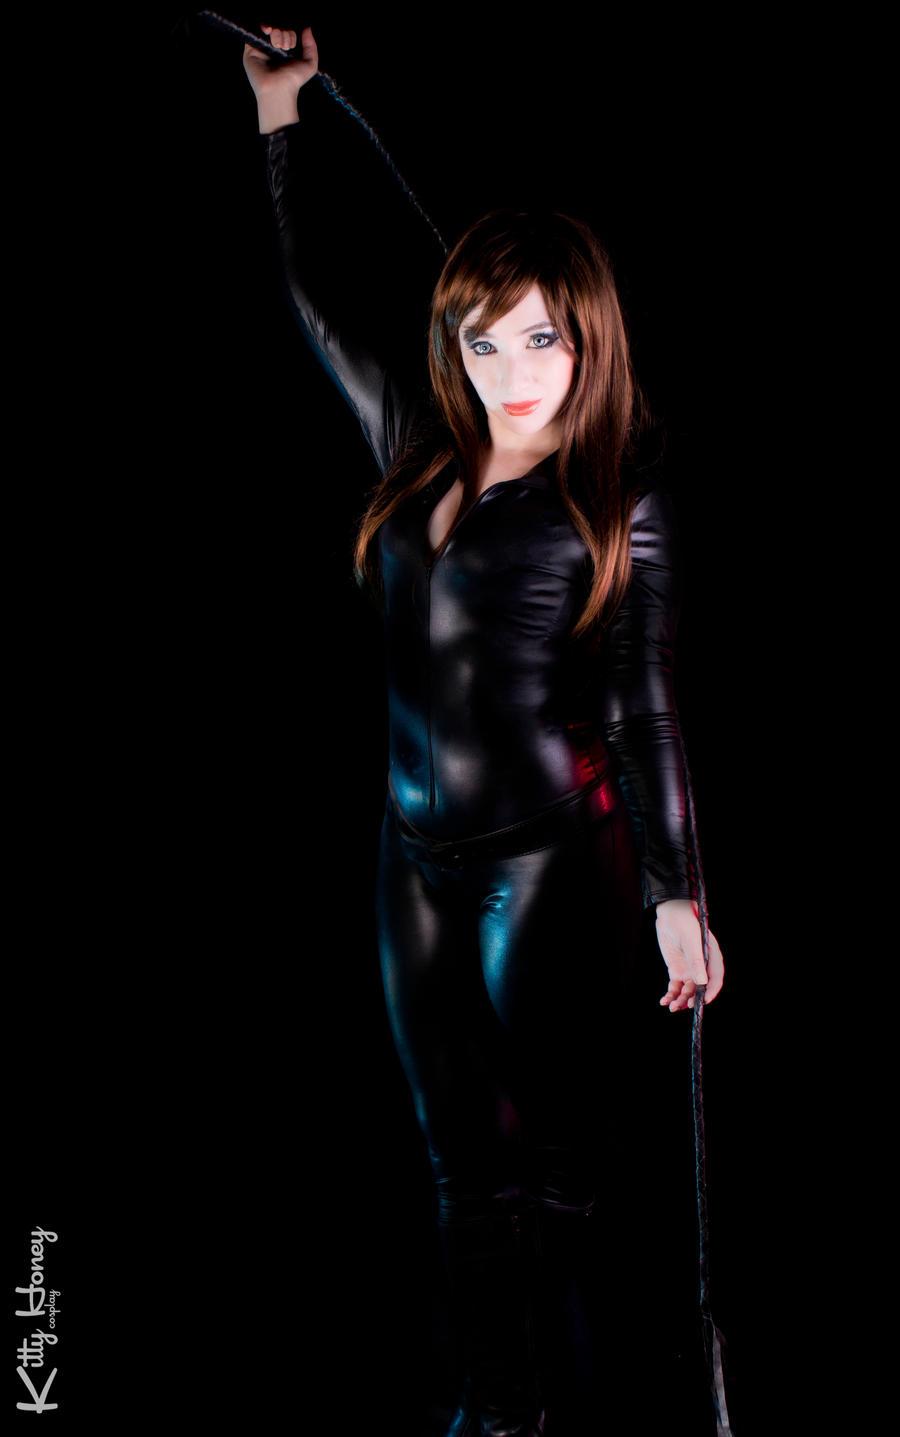 Danger Girl 02 - Sydney Savage Cosplay by Kitty-Honey